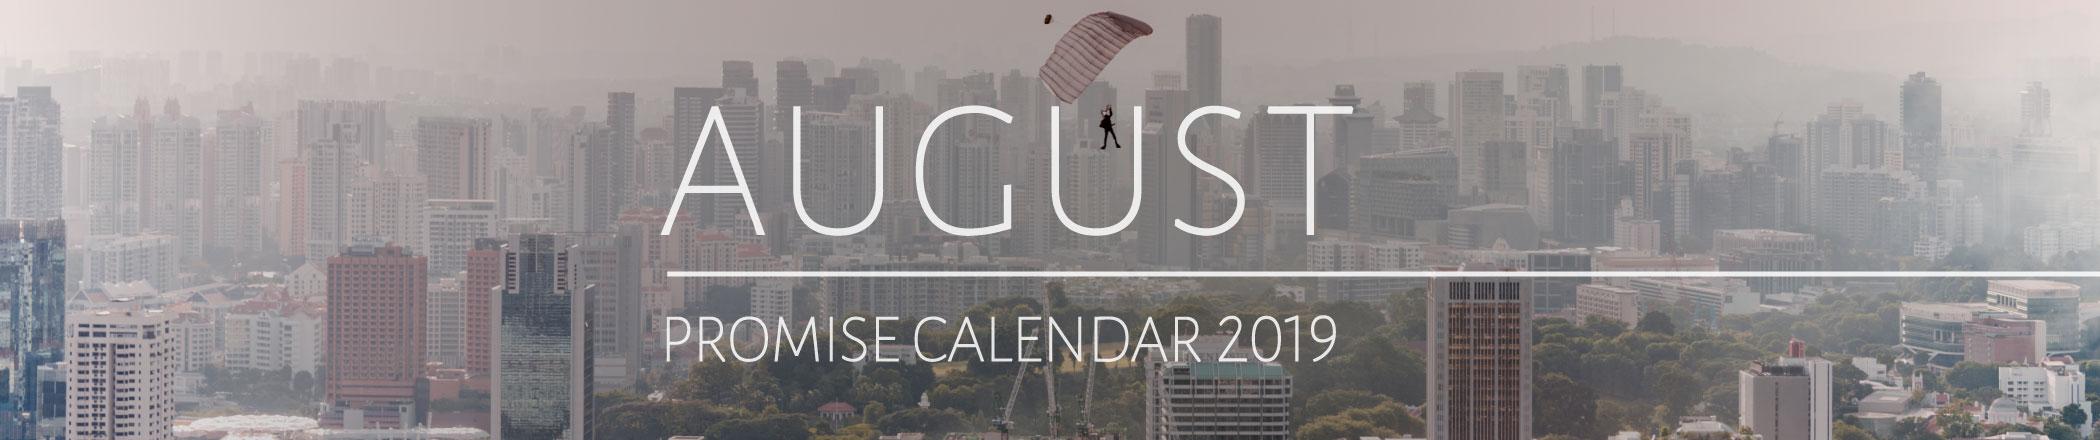 August 2019 Promise Calendar Header